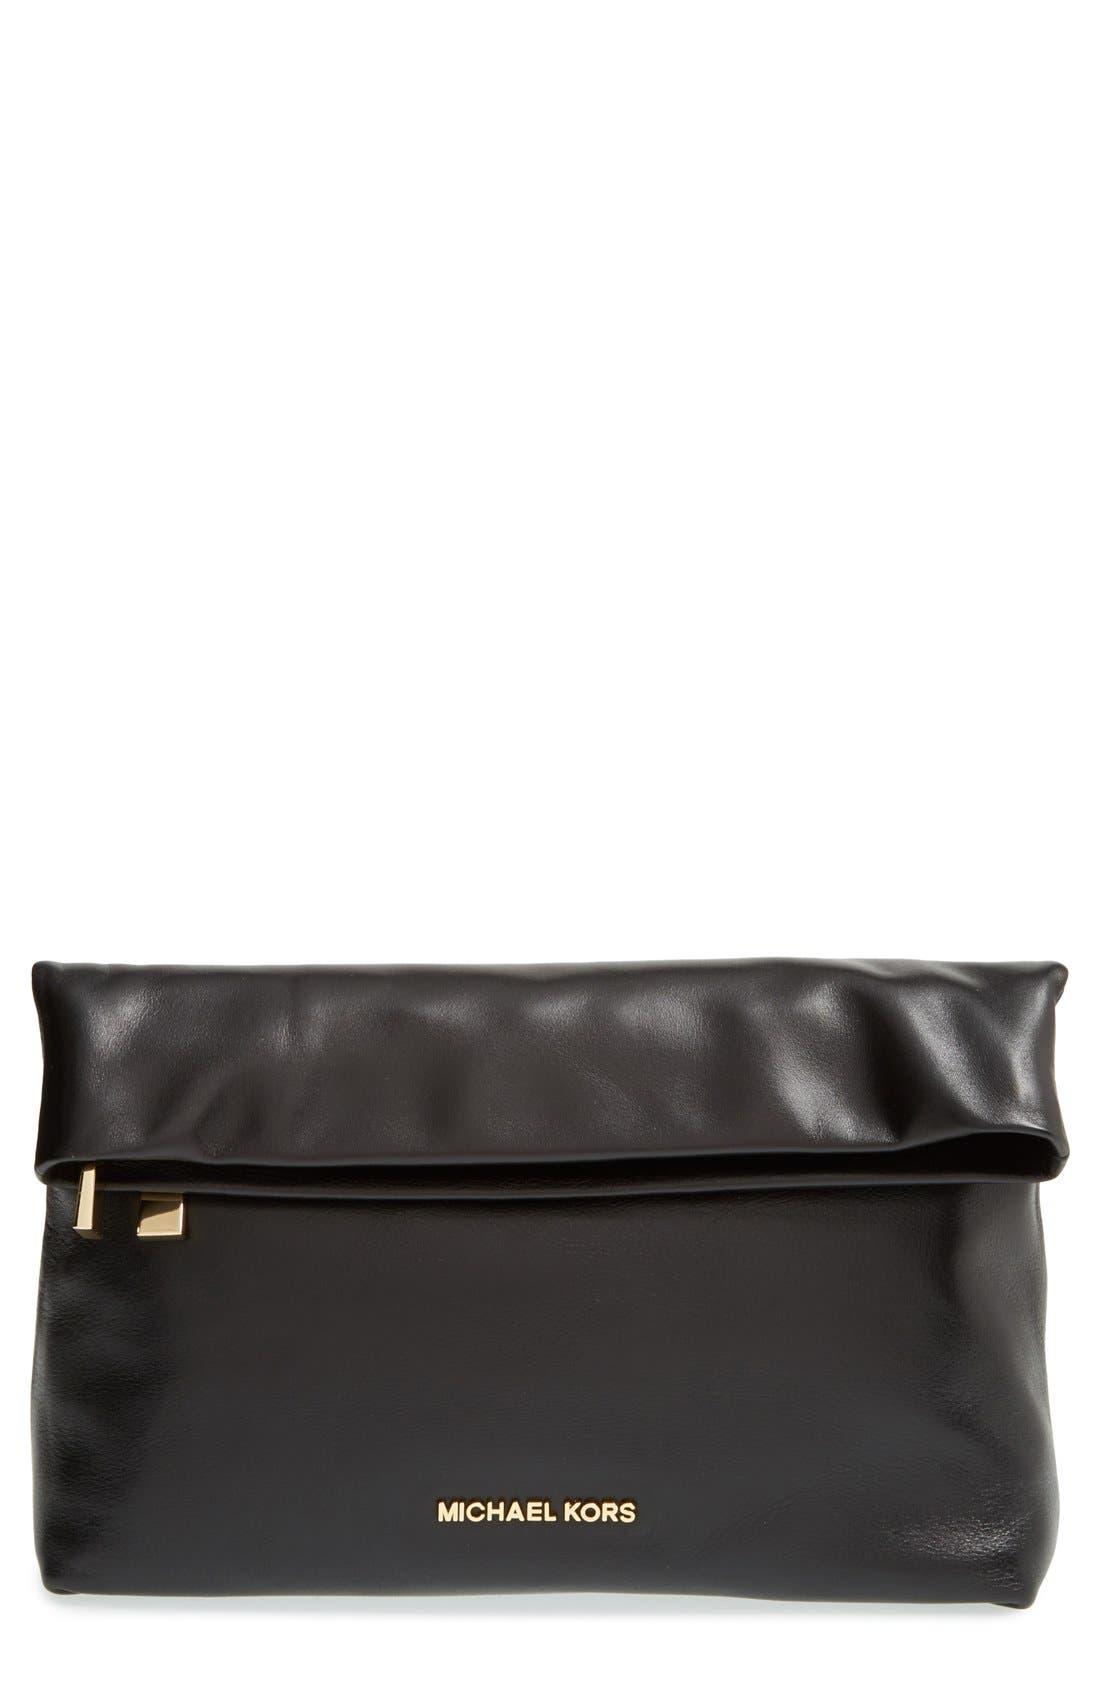 Alternate Image 1 Selected - MICHAEL Michael Kors 'Daria' Leather Foldover Clutch